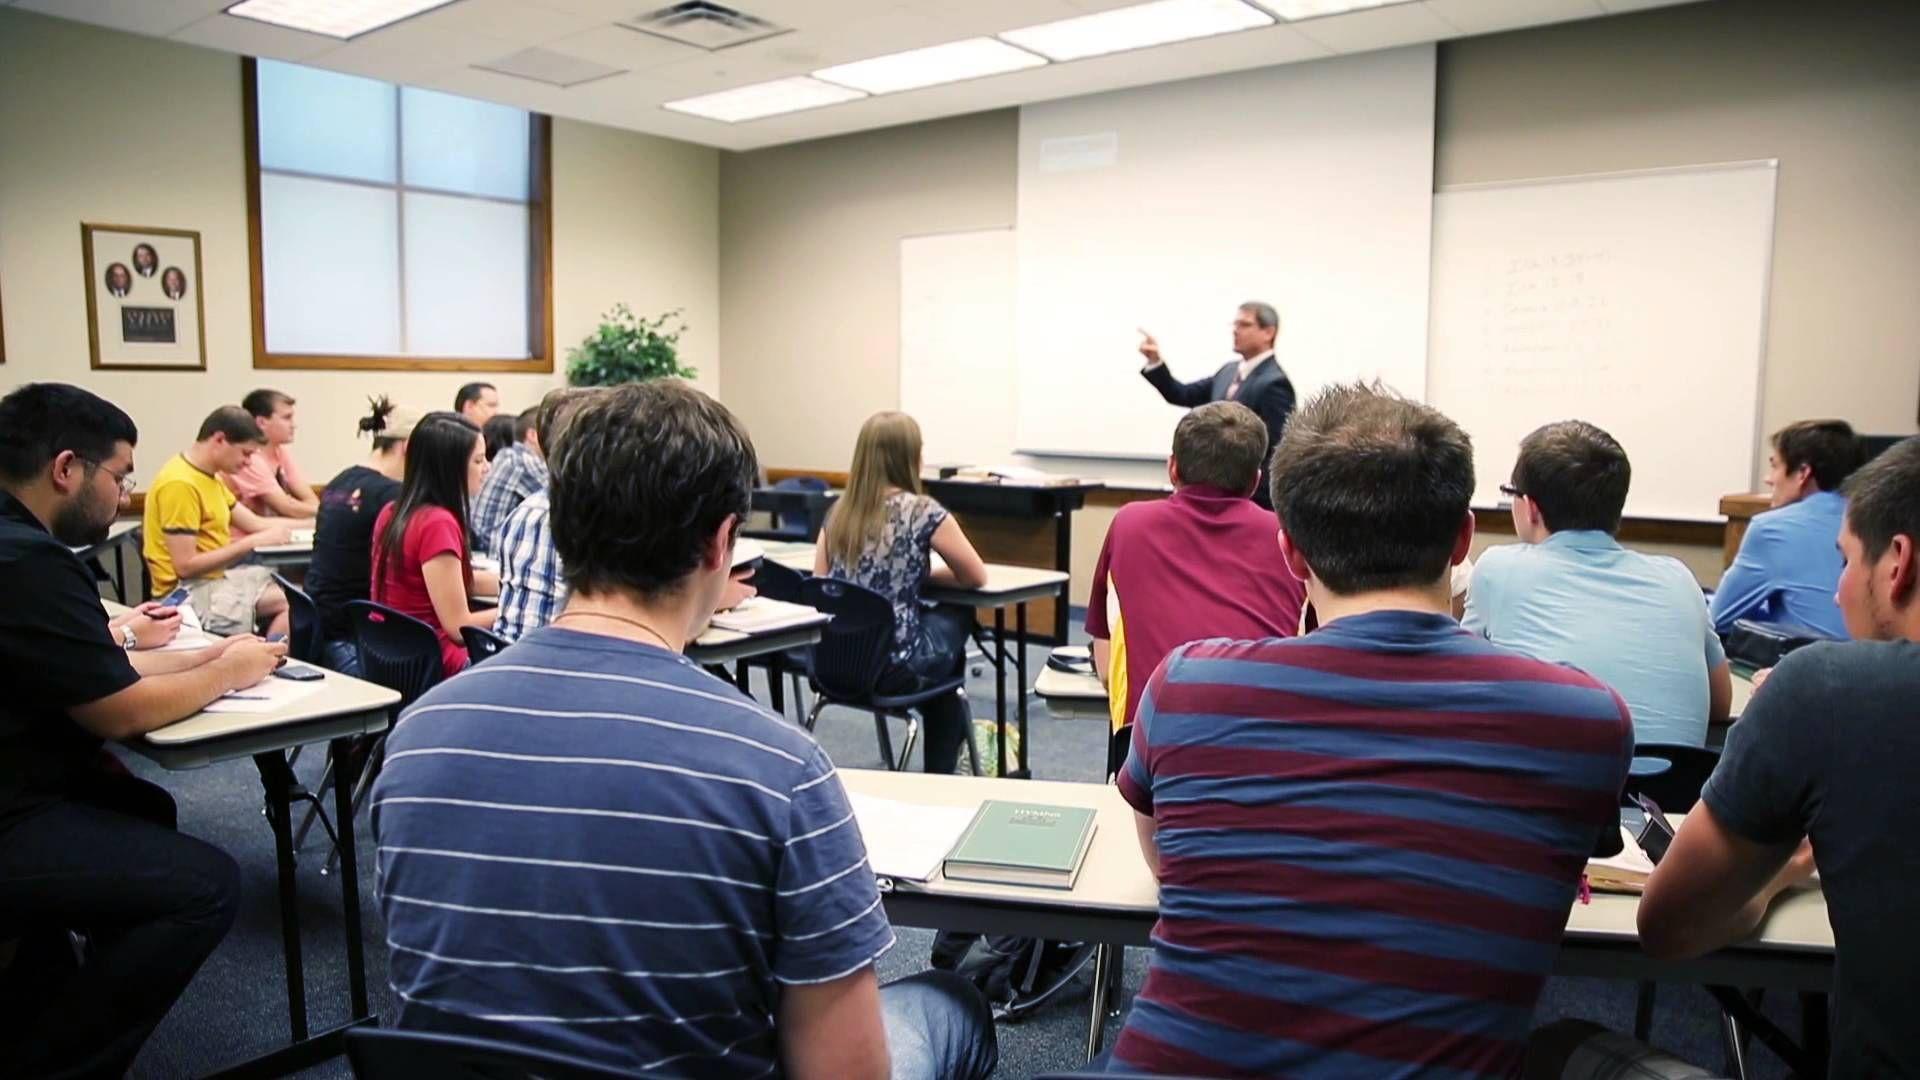 Church leaders on education education good student leader